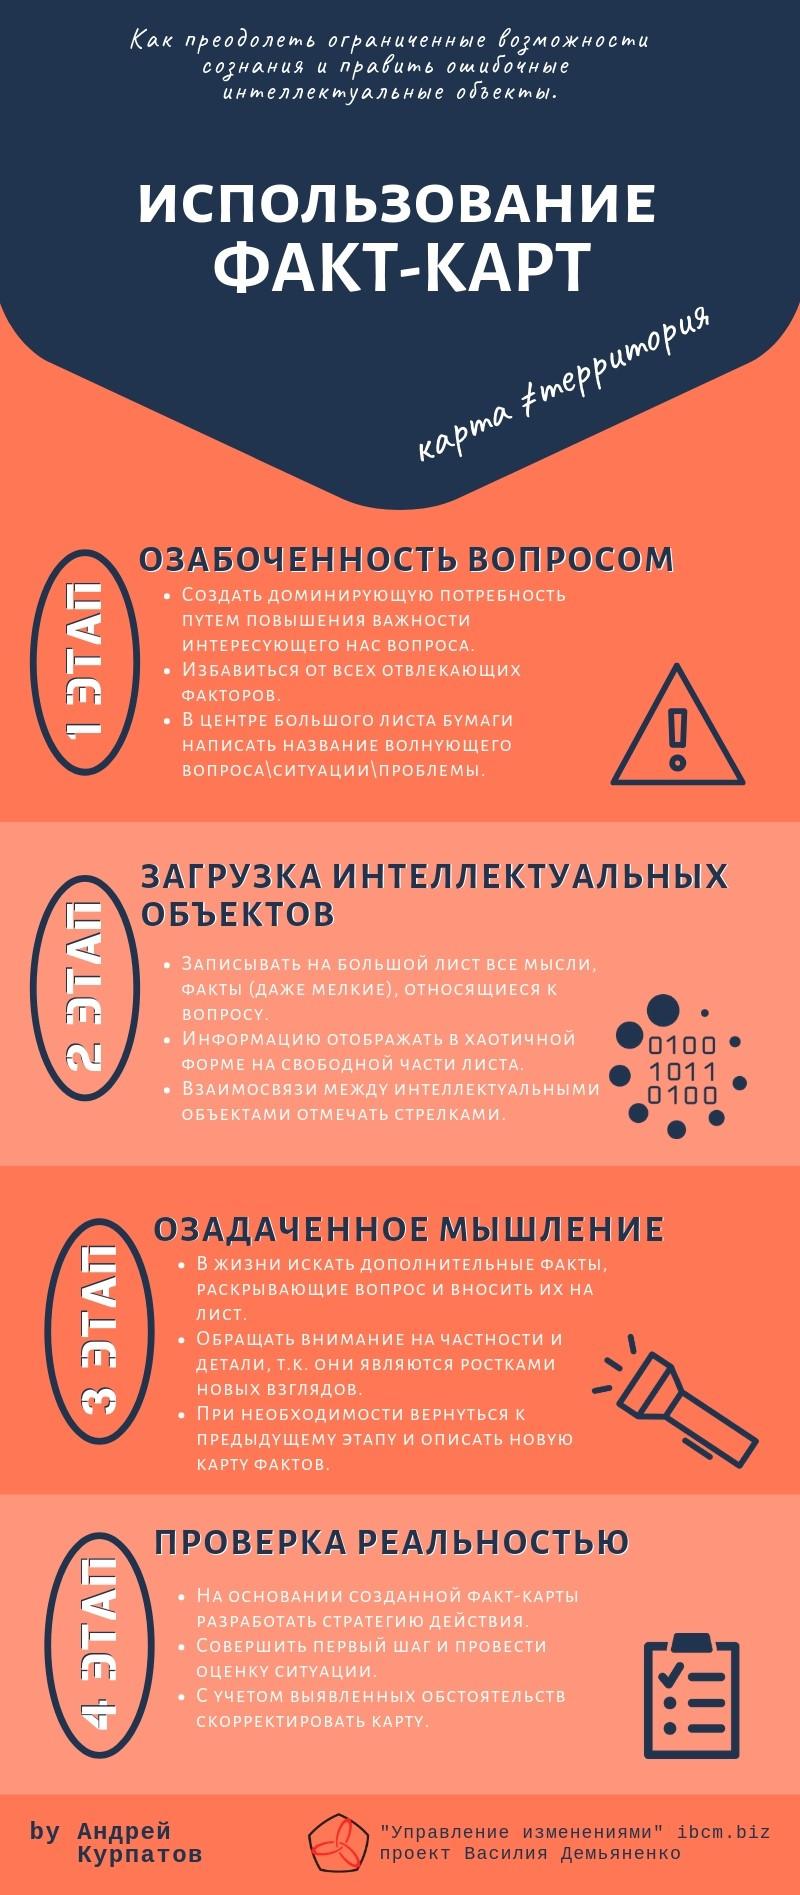 Факт-карты Андрей Курпатов